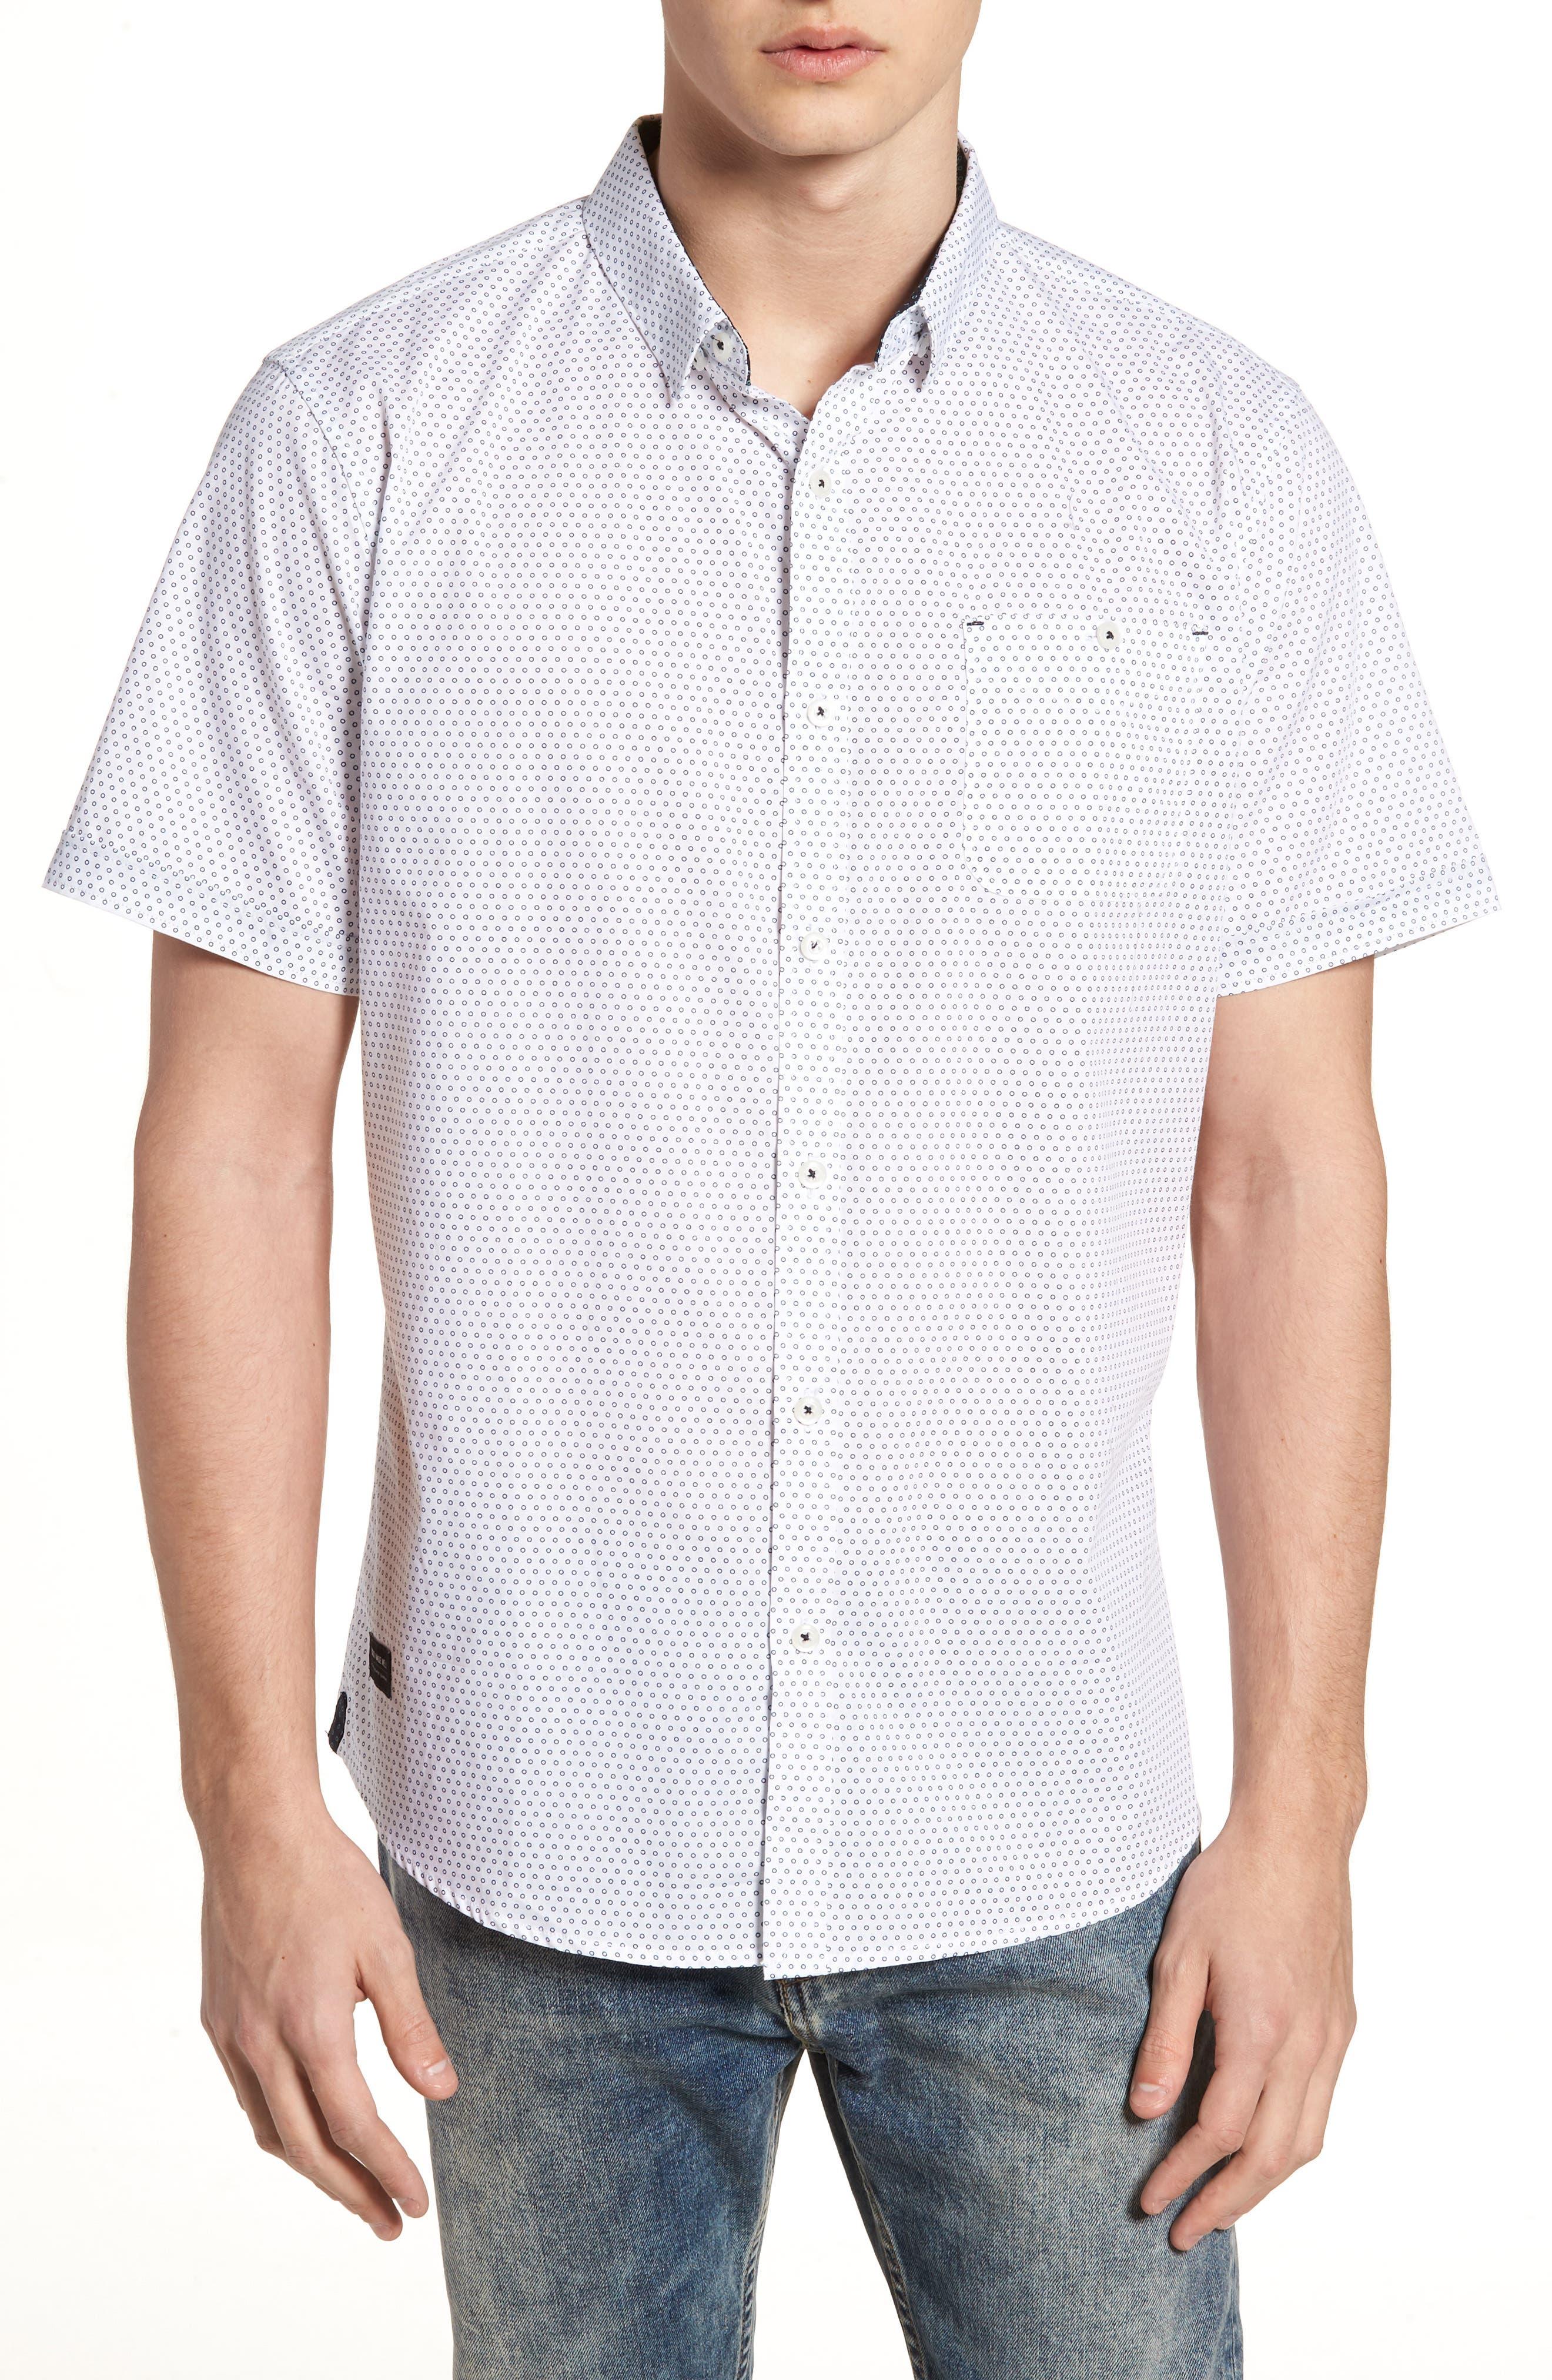 Lights of Home Slim Fit Short Sleeve Sport Shirt,                             Main thumbnail 1, color,                             White